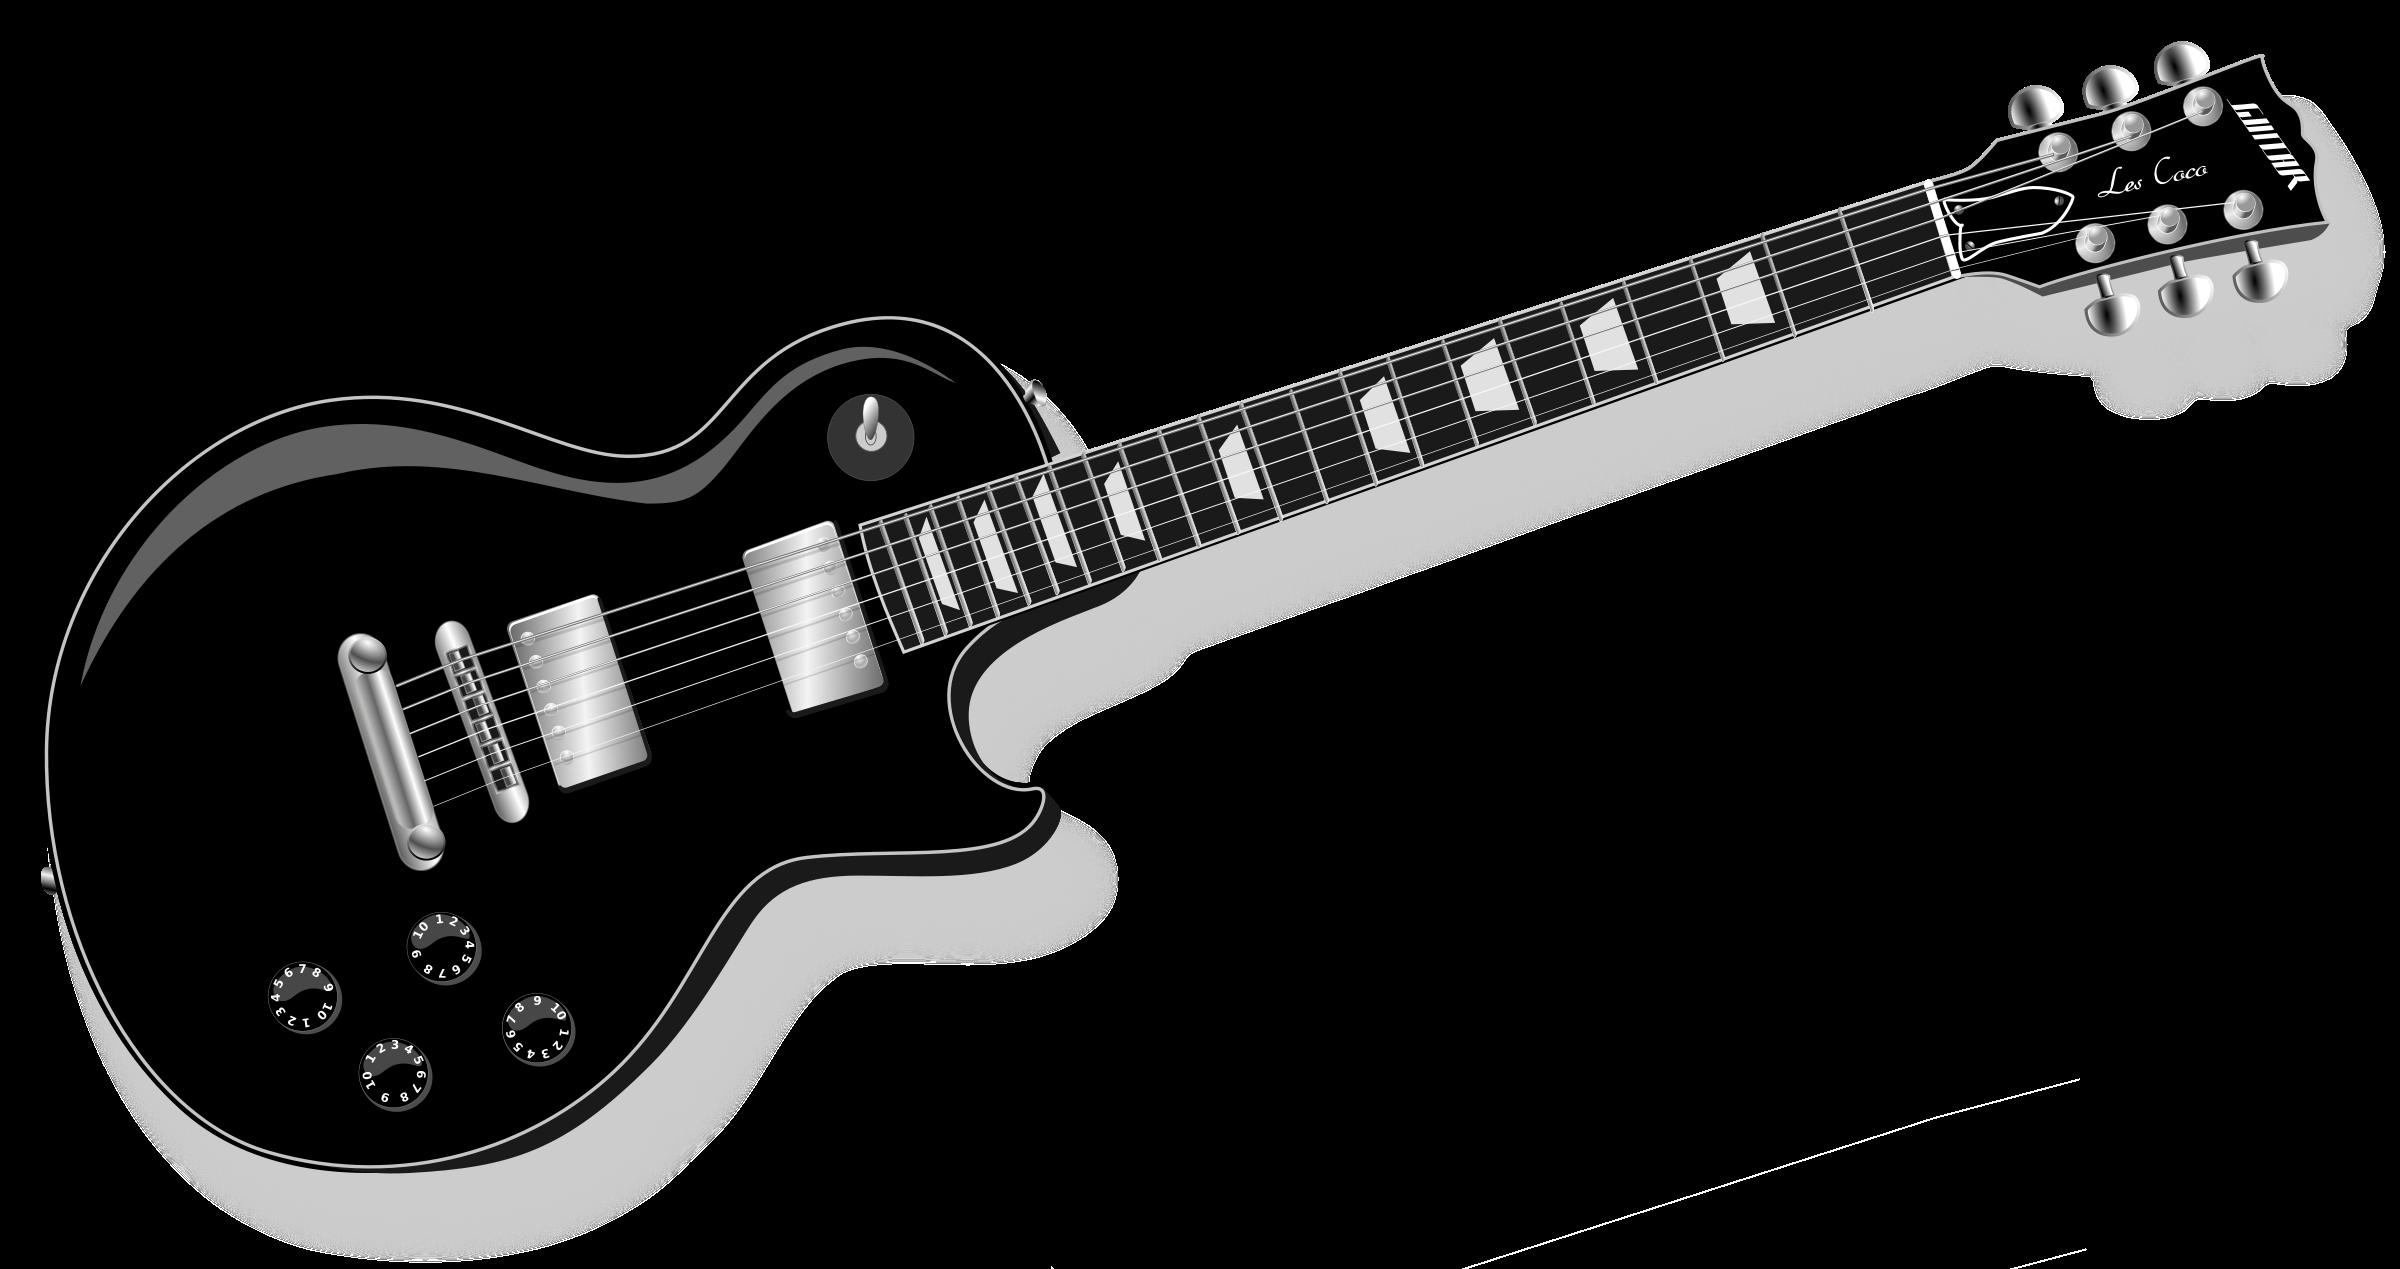 Pete the cat guitar clipart png transparent stock Guitar Clipart Free | jokingart.com Guitar Clipart png transparent stock